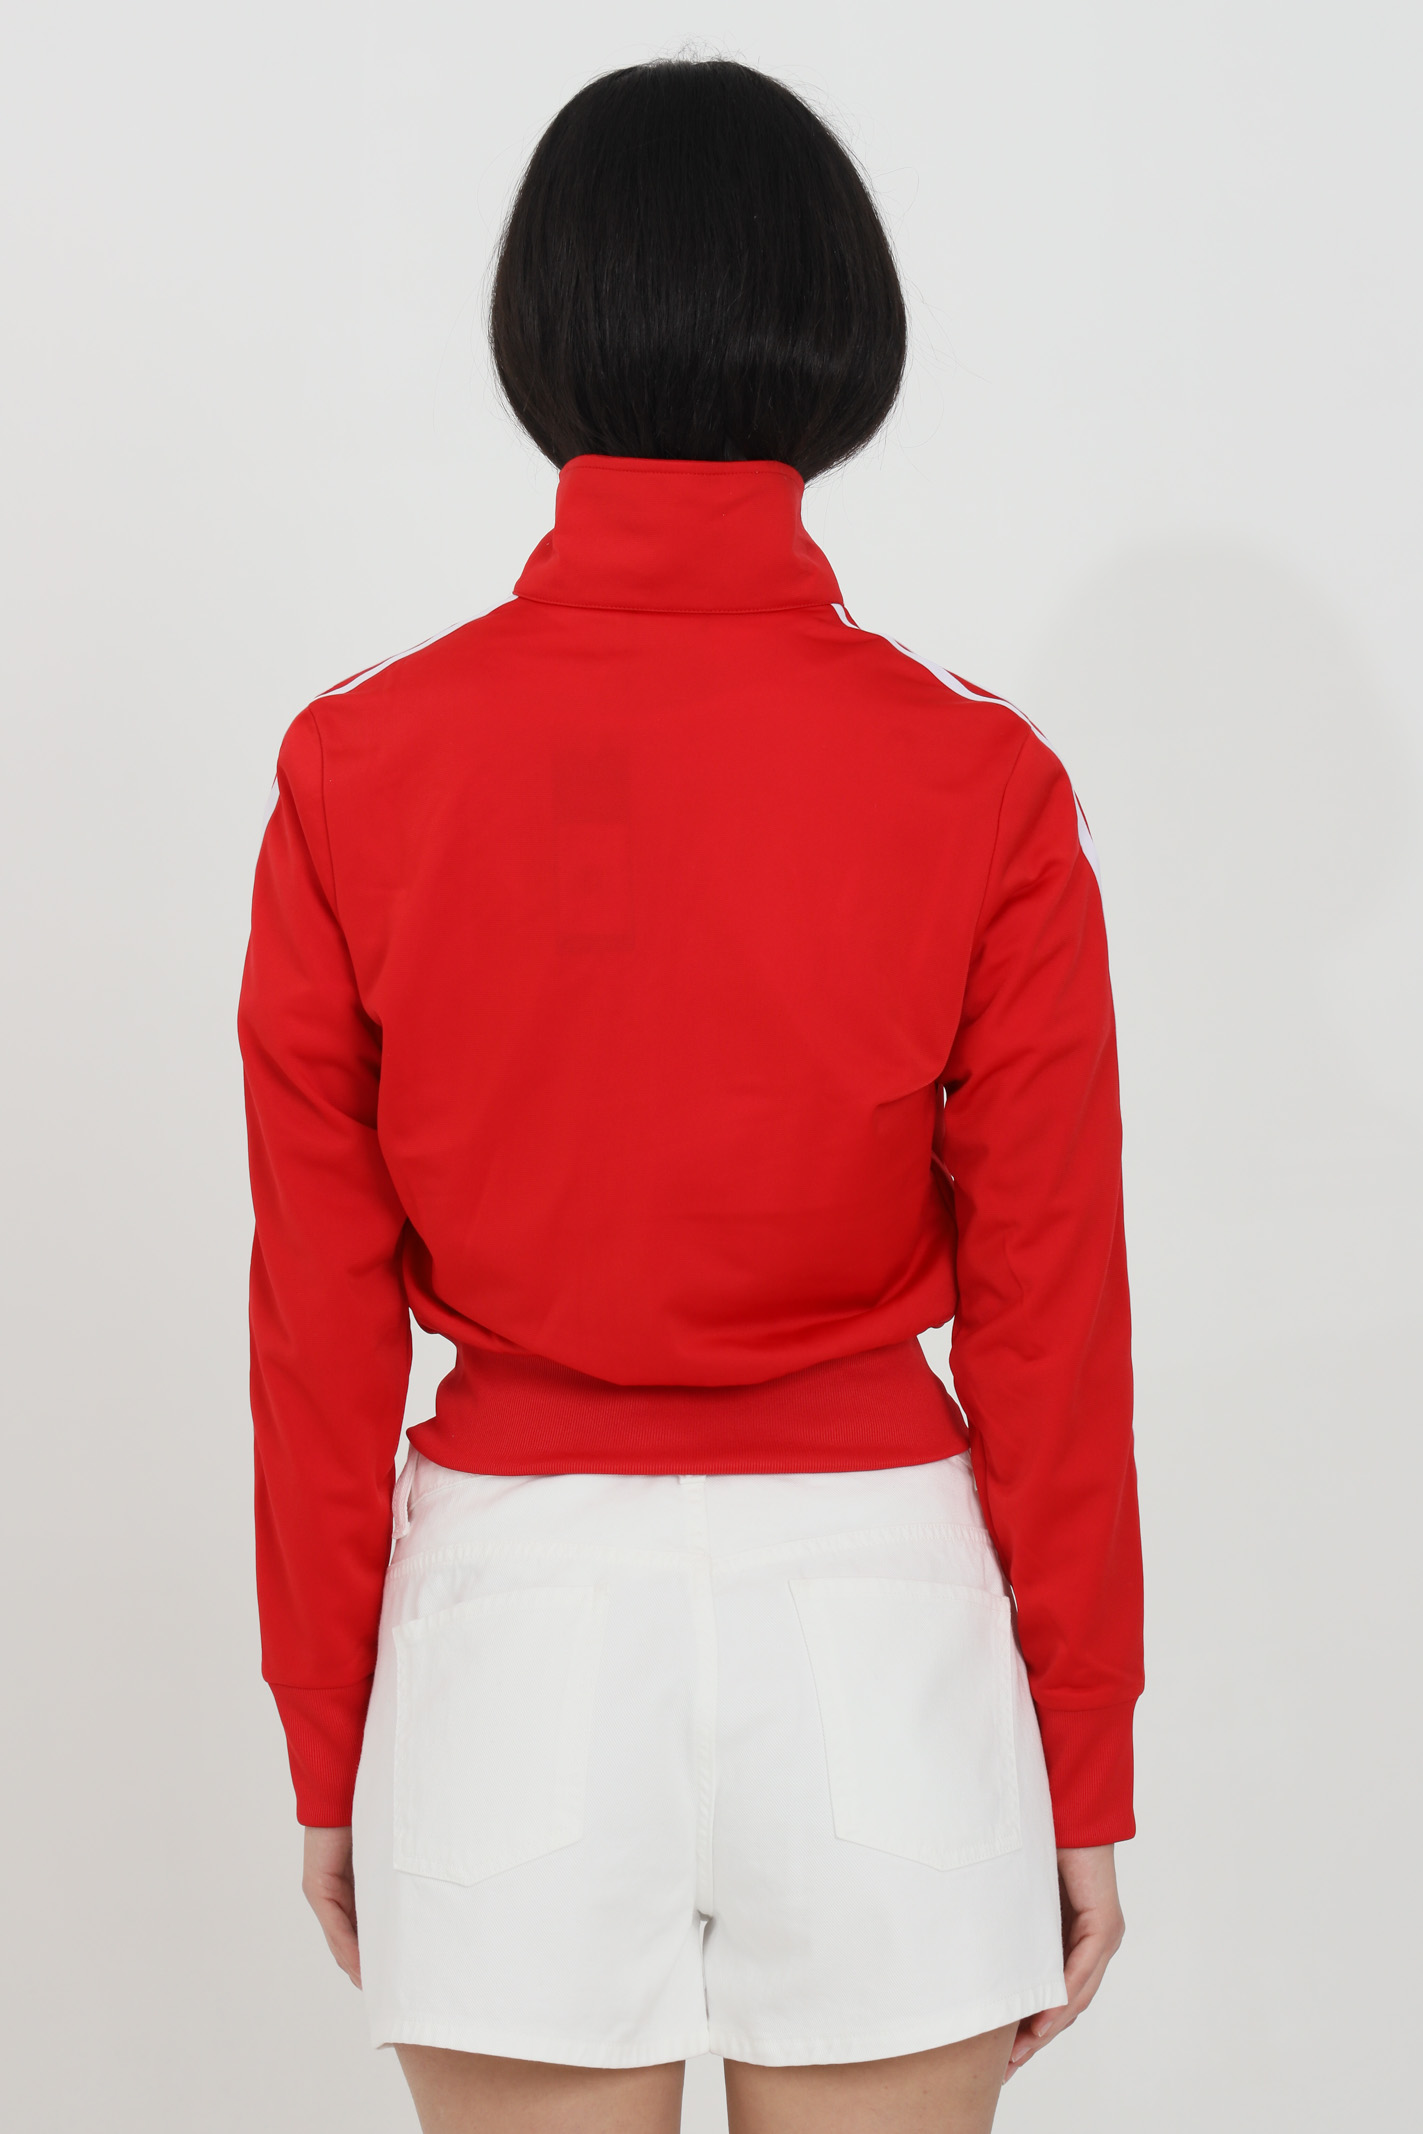 Track jacket adicolor classic firebird primeblue ADIDAS | Sweatshirt | GN2818.